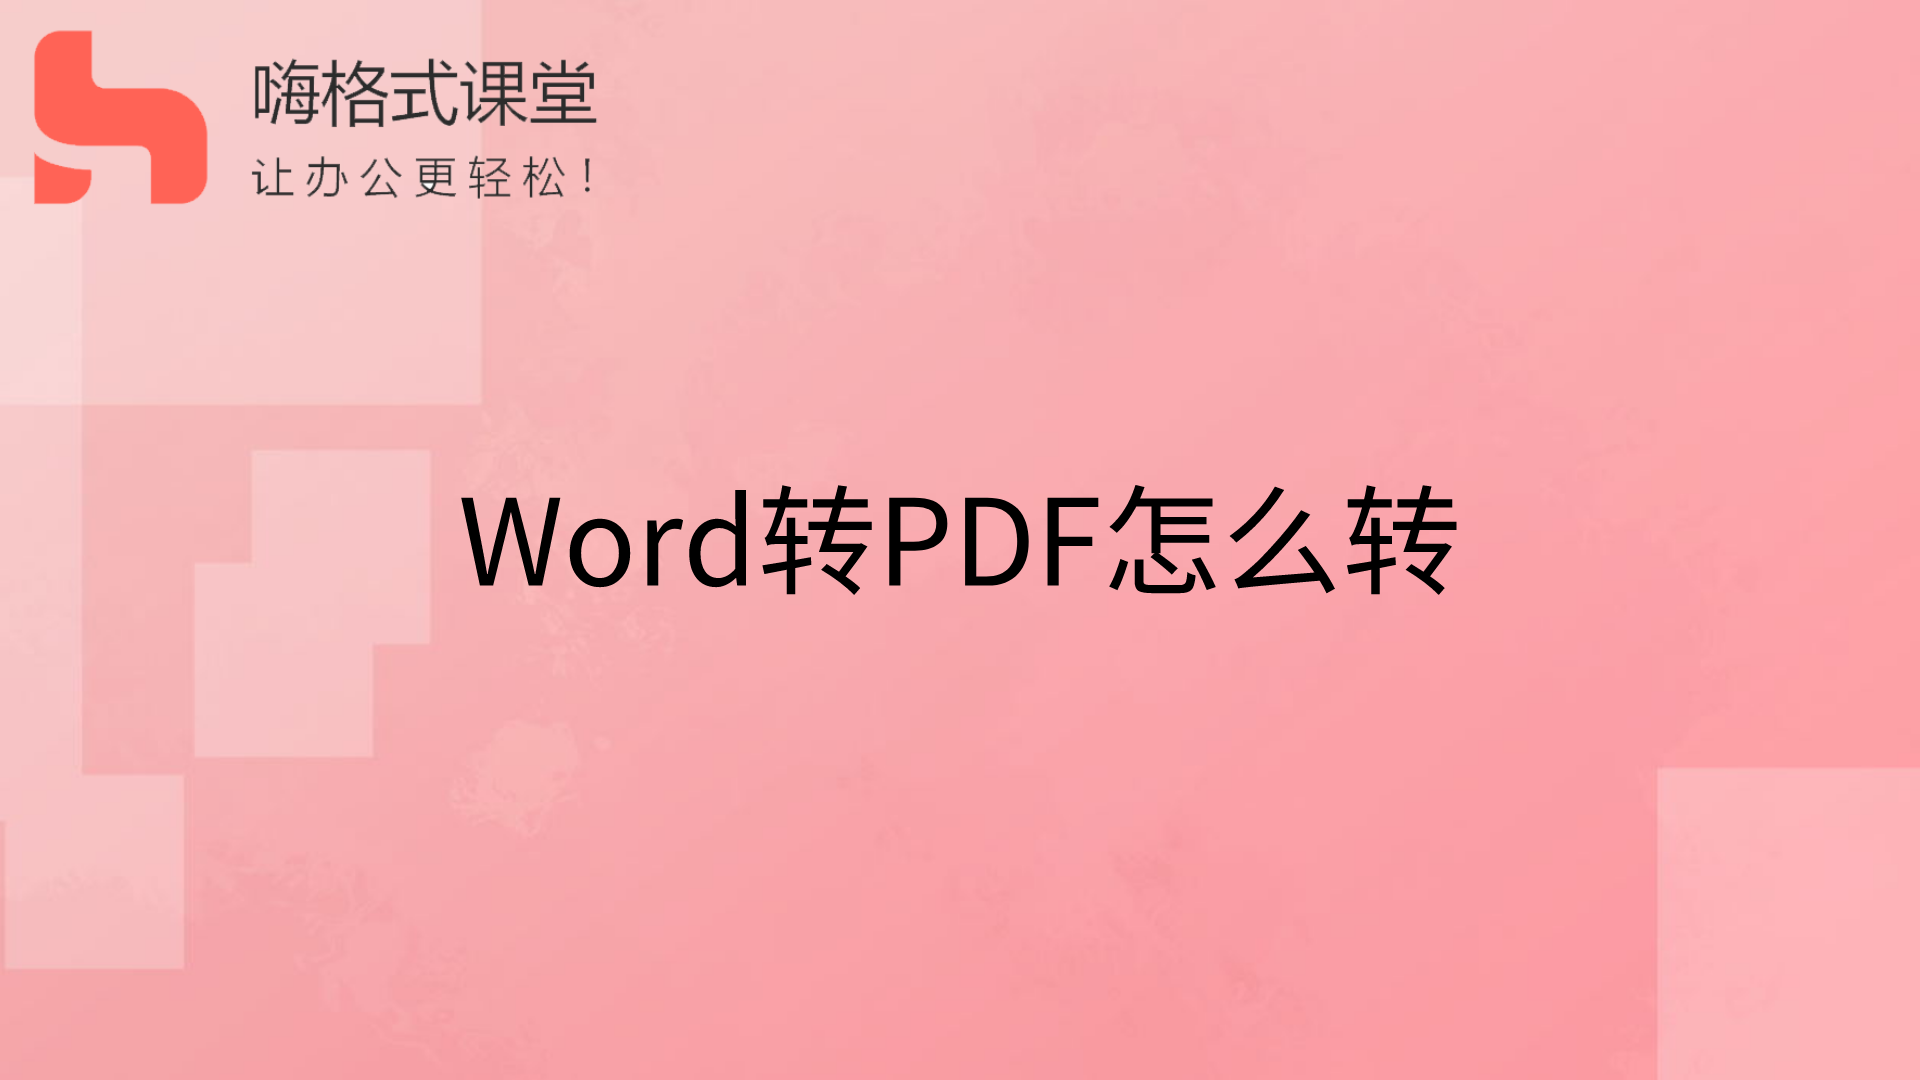 Word转PDF怎么转s